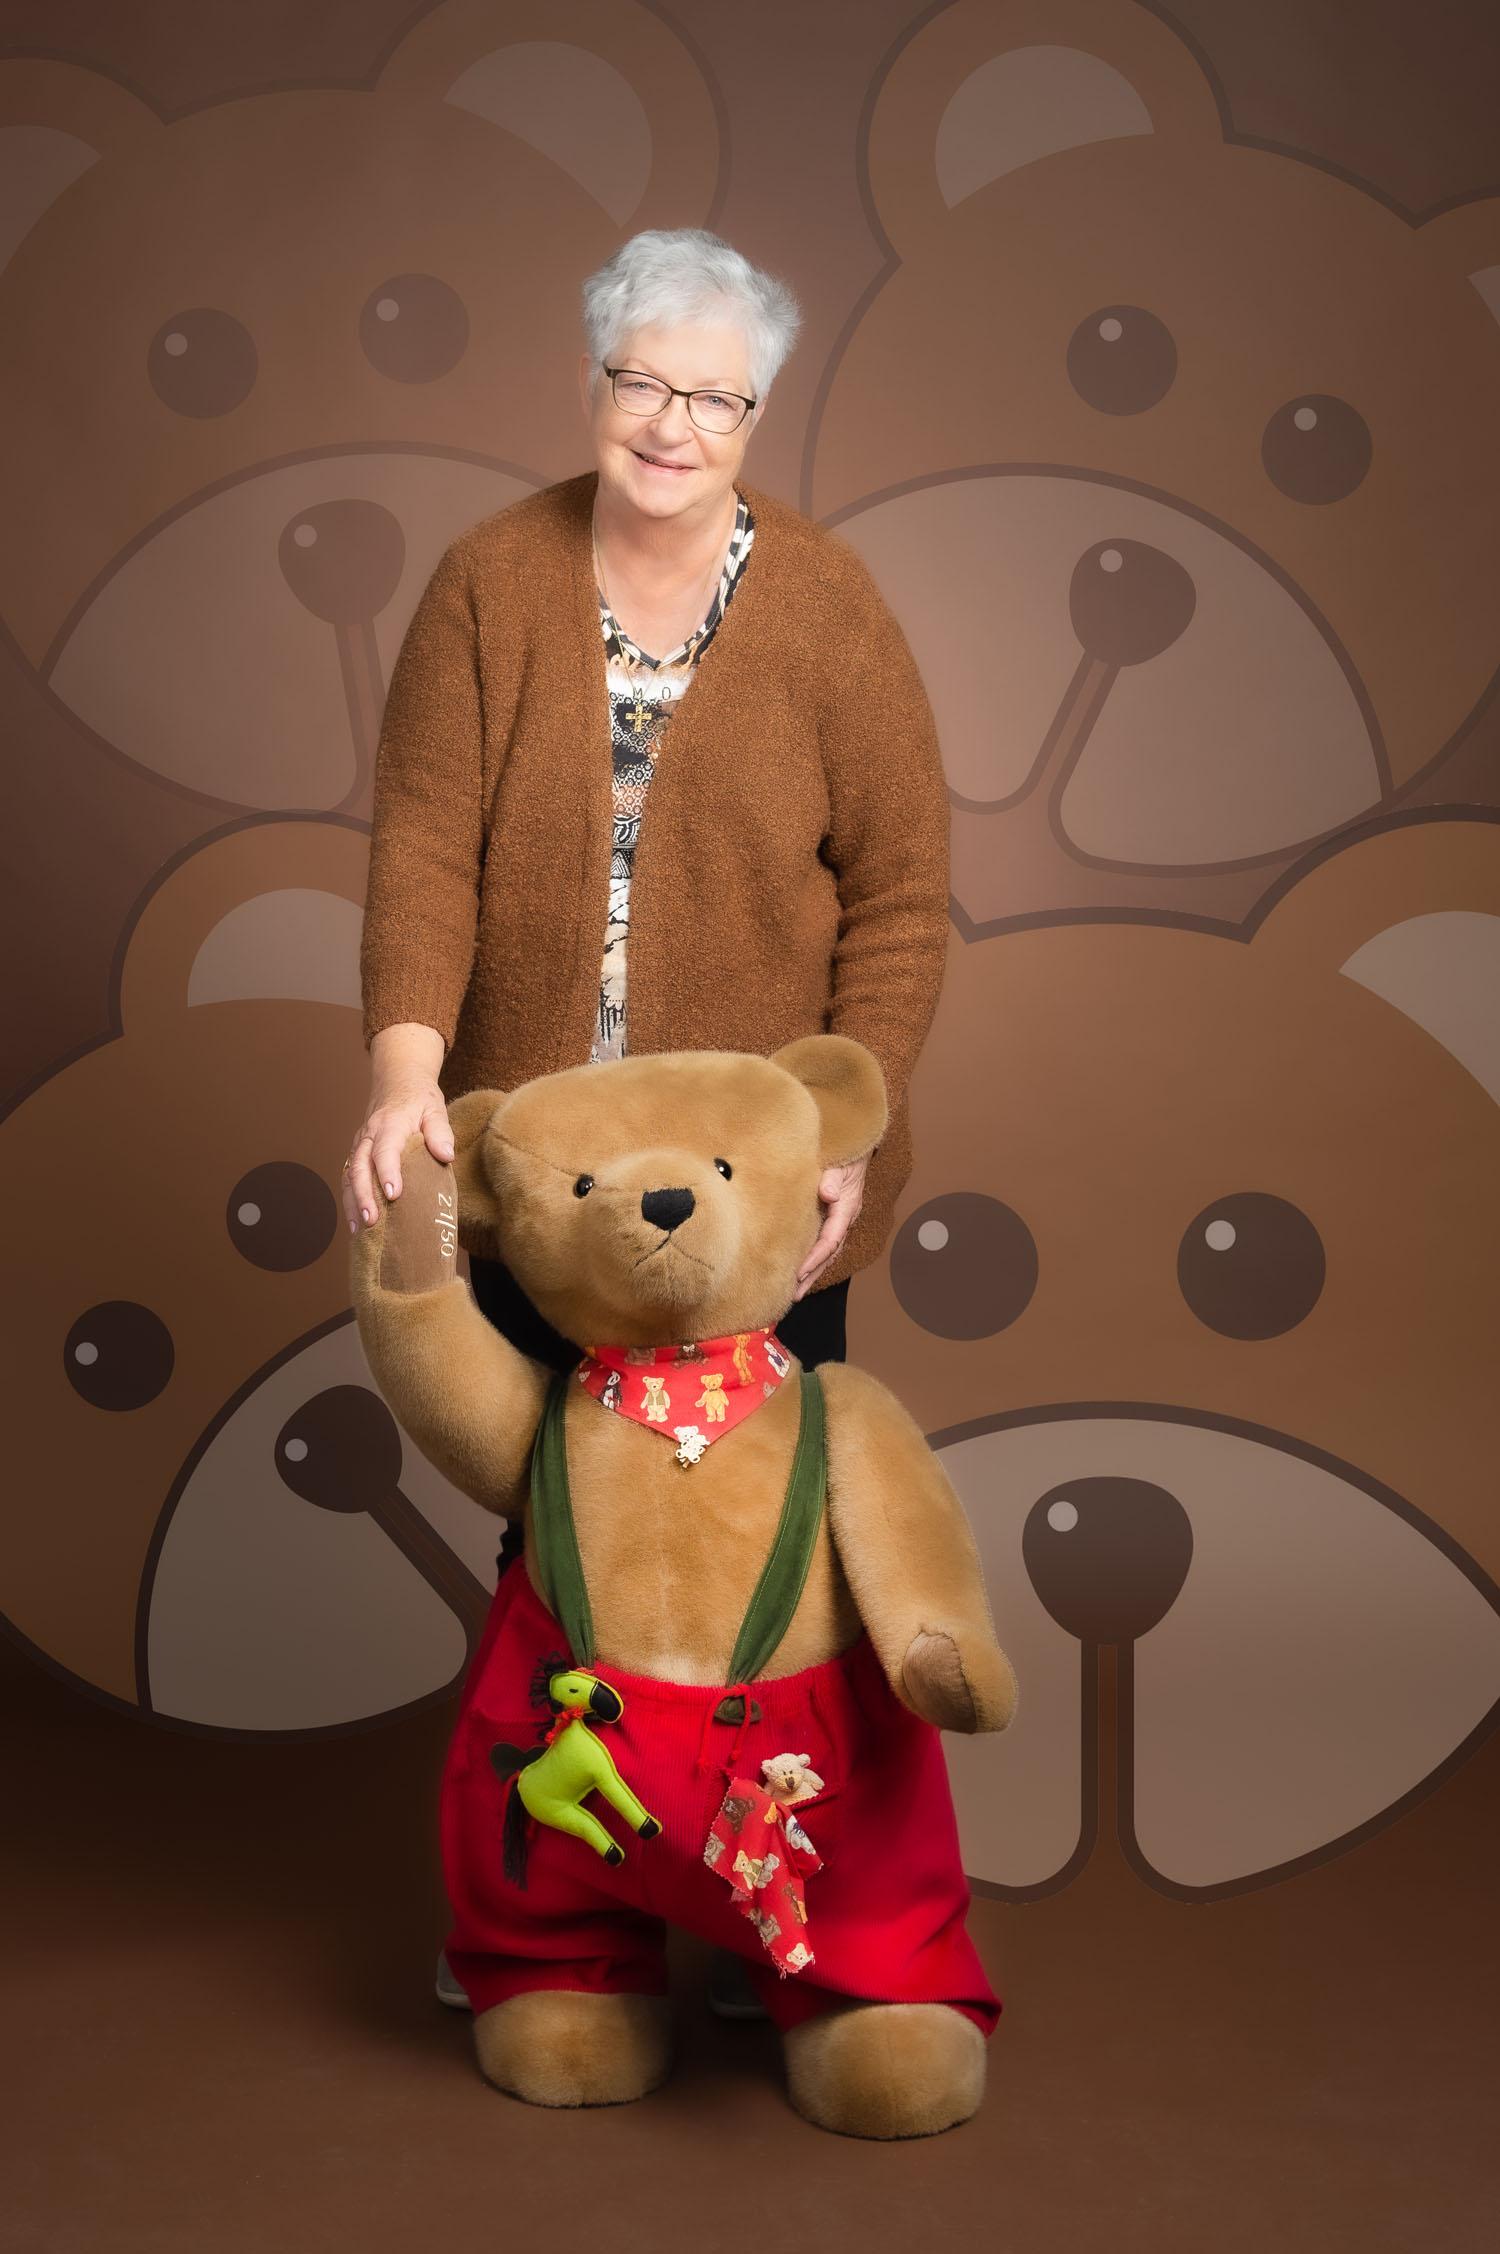 © Dr. Ursula Fellberg, Bruno ein Hermann Hirschaid Teddybär